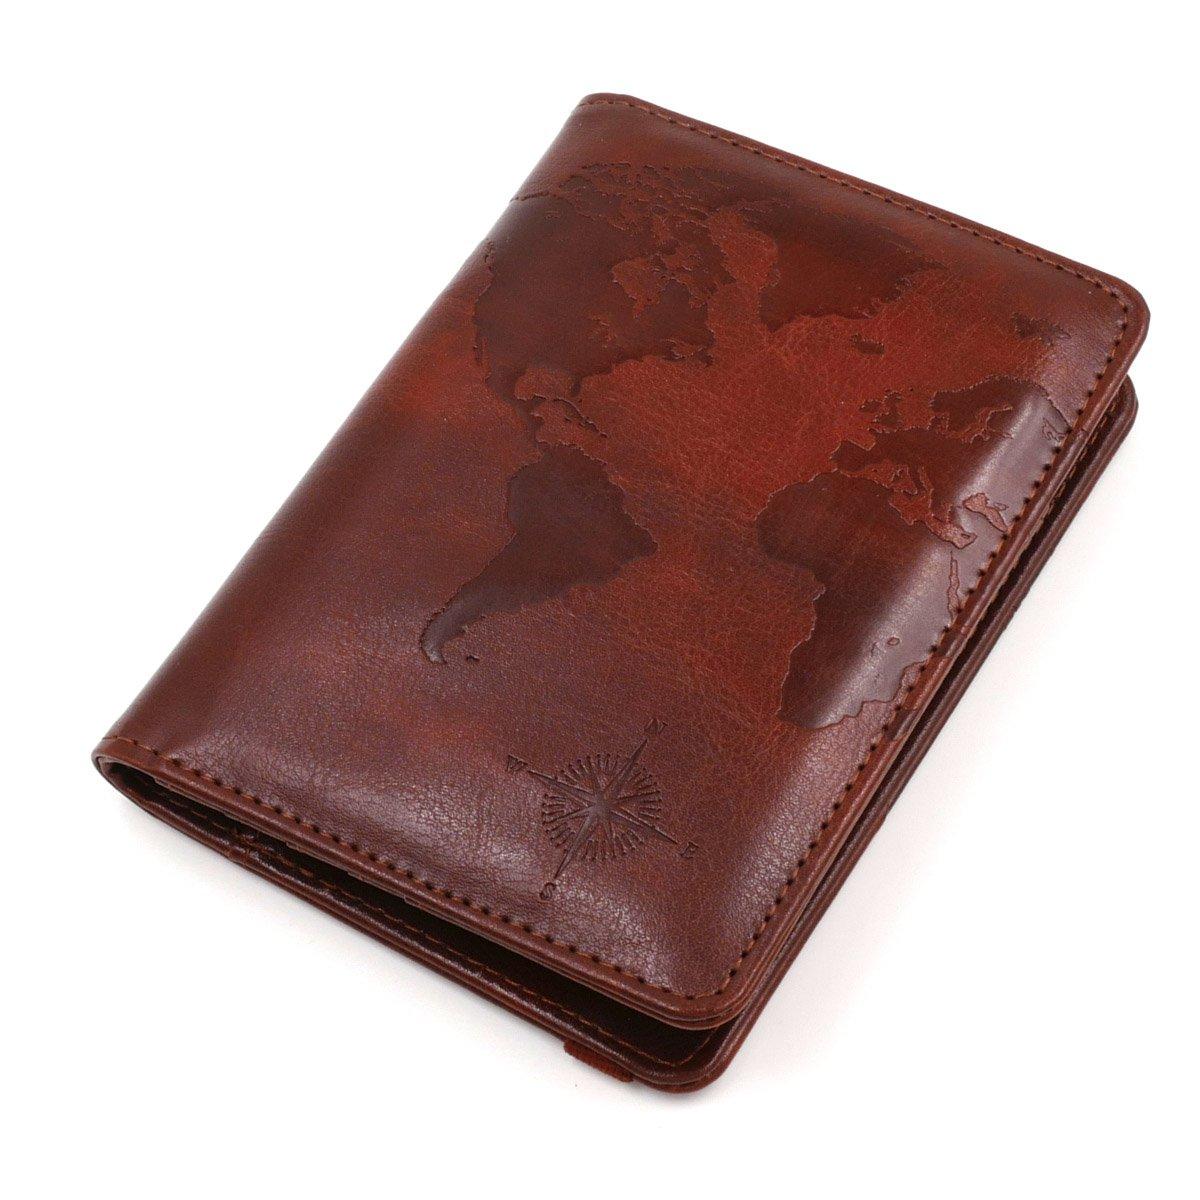 Kandouren RFID Blocking Passport Holder Cover Case,travel luggage passport wallet made with Brown Map Crazy Horse PU Leather for Men & Women by kandouren (Image #5)